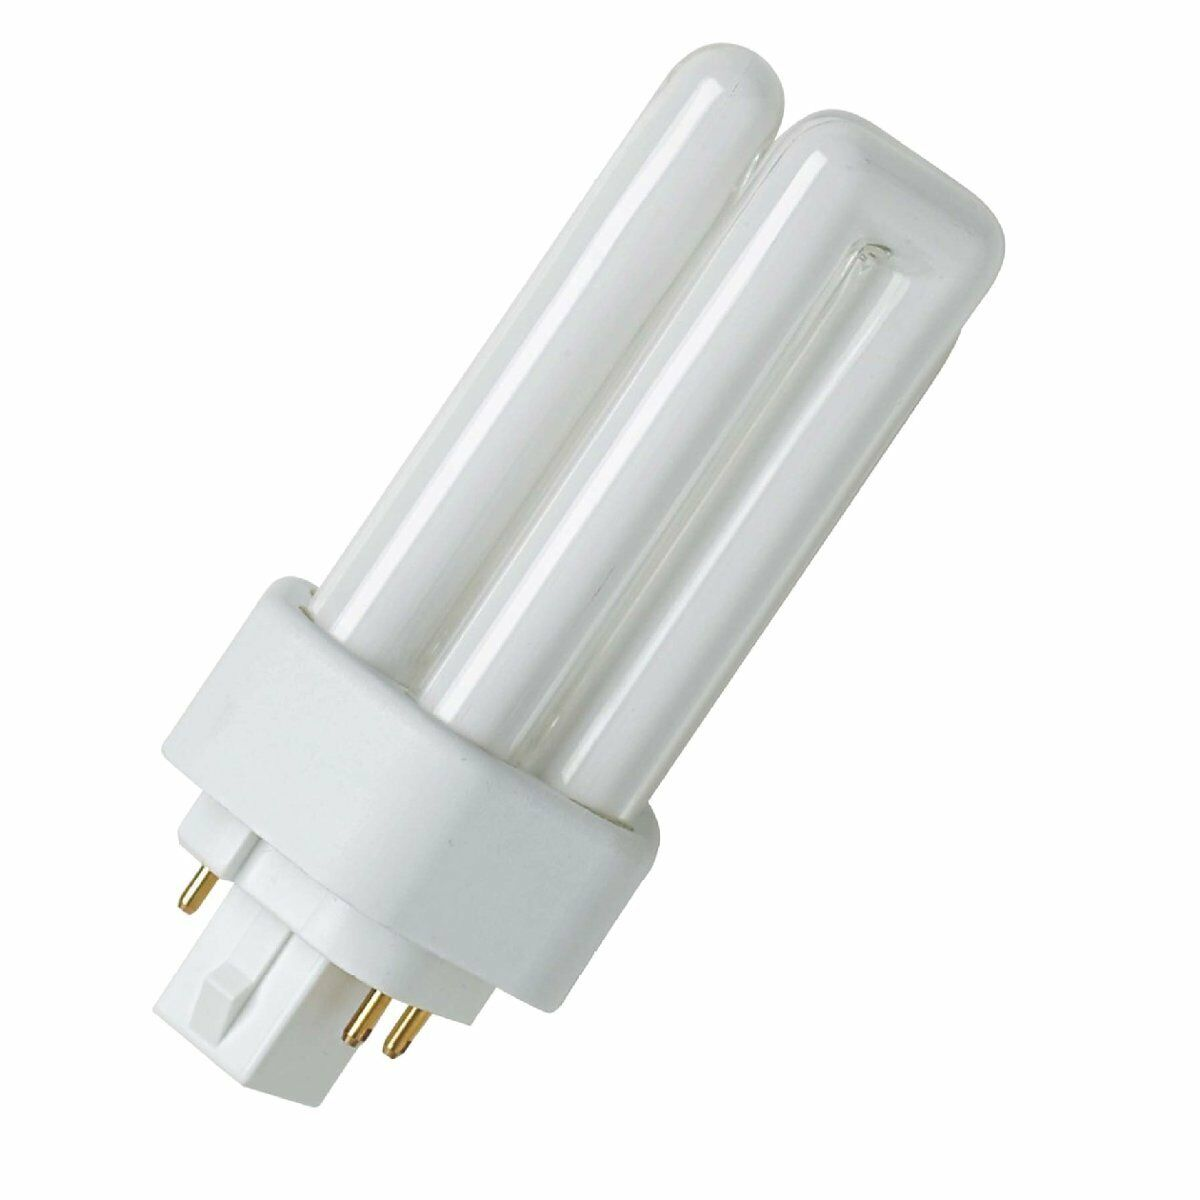 10x Osram Kompaktleuchtstofflampe DULUX T E PLUS - GX24q, 830 Warmweiß - 32W